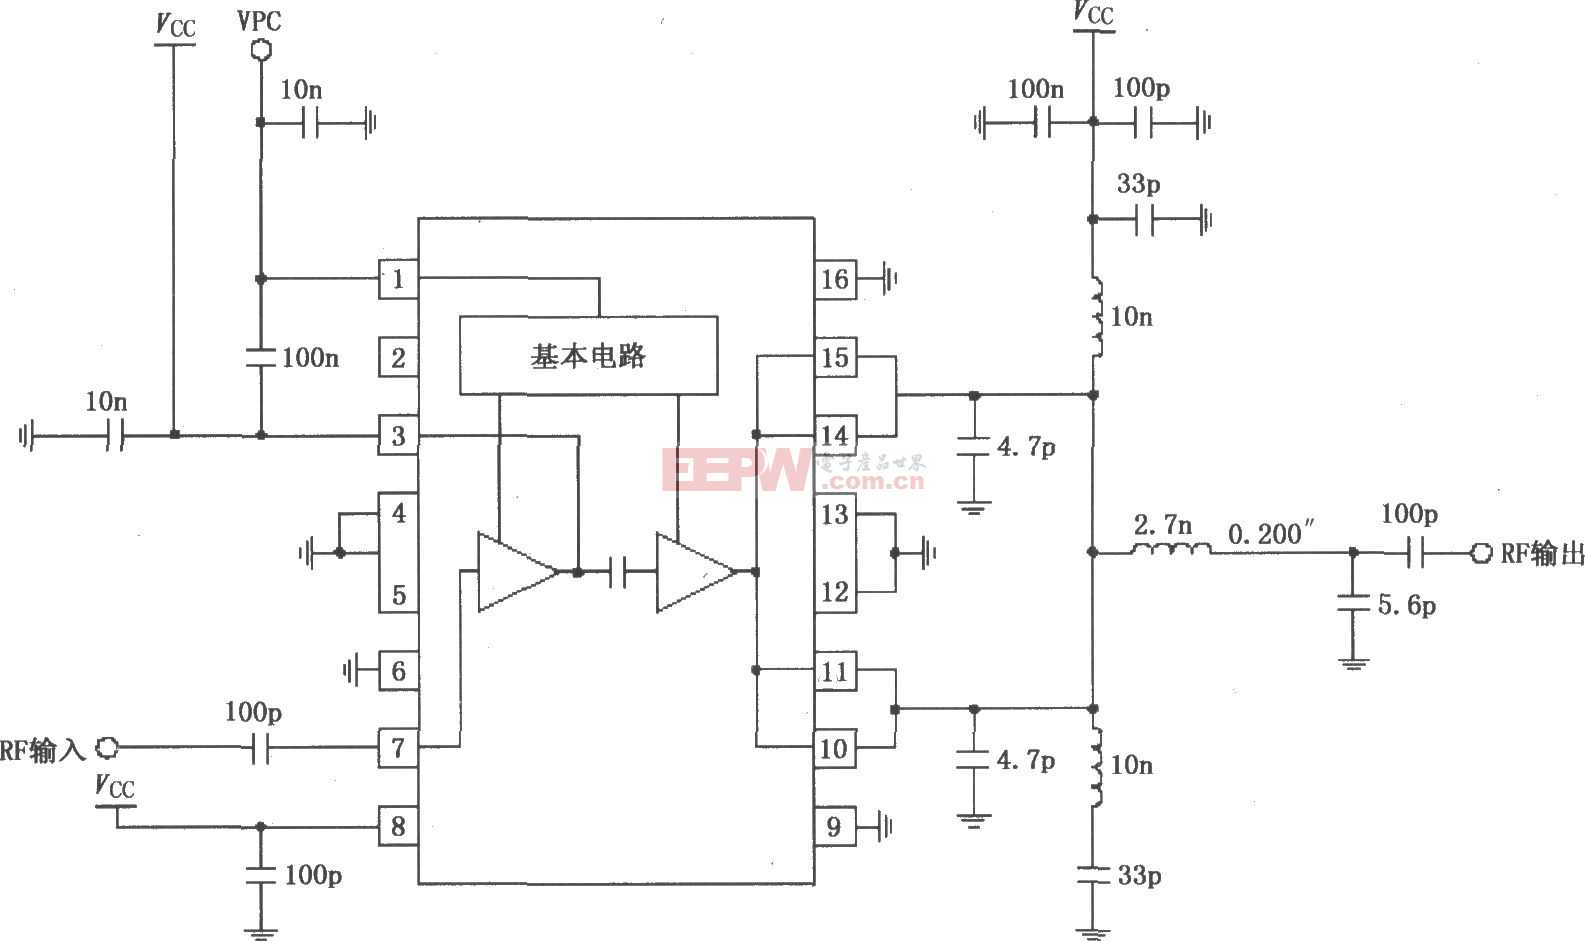 RF2131在4.8V電源供電時的最佳效率功率放大電路圖